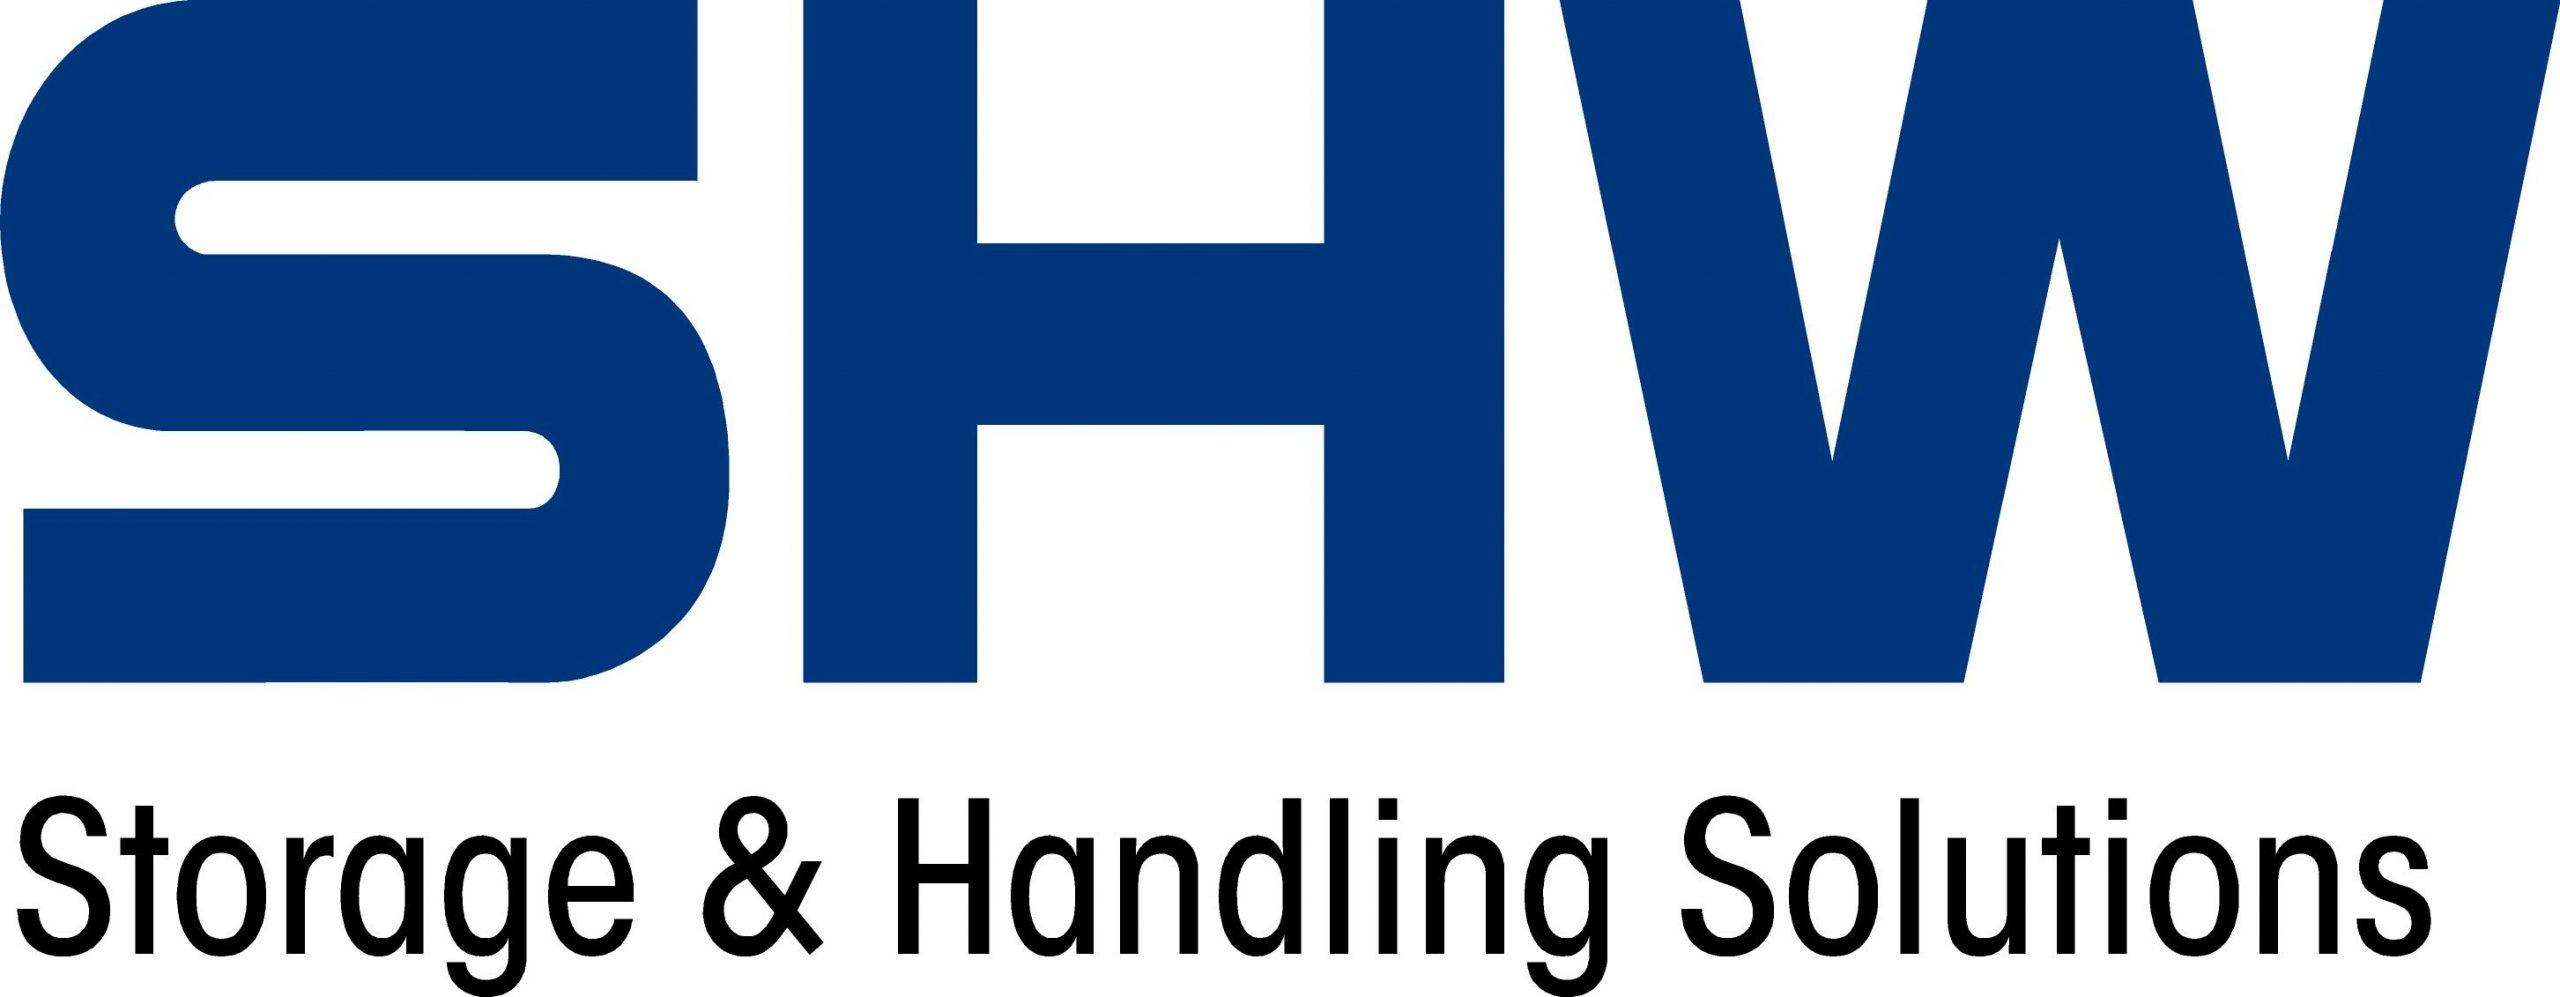 SHW Storage & Handling Solutions GmbH